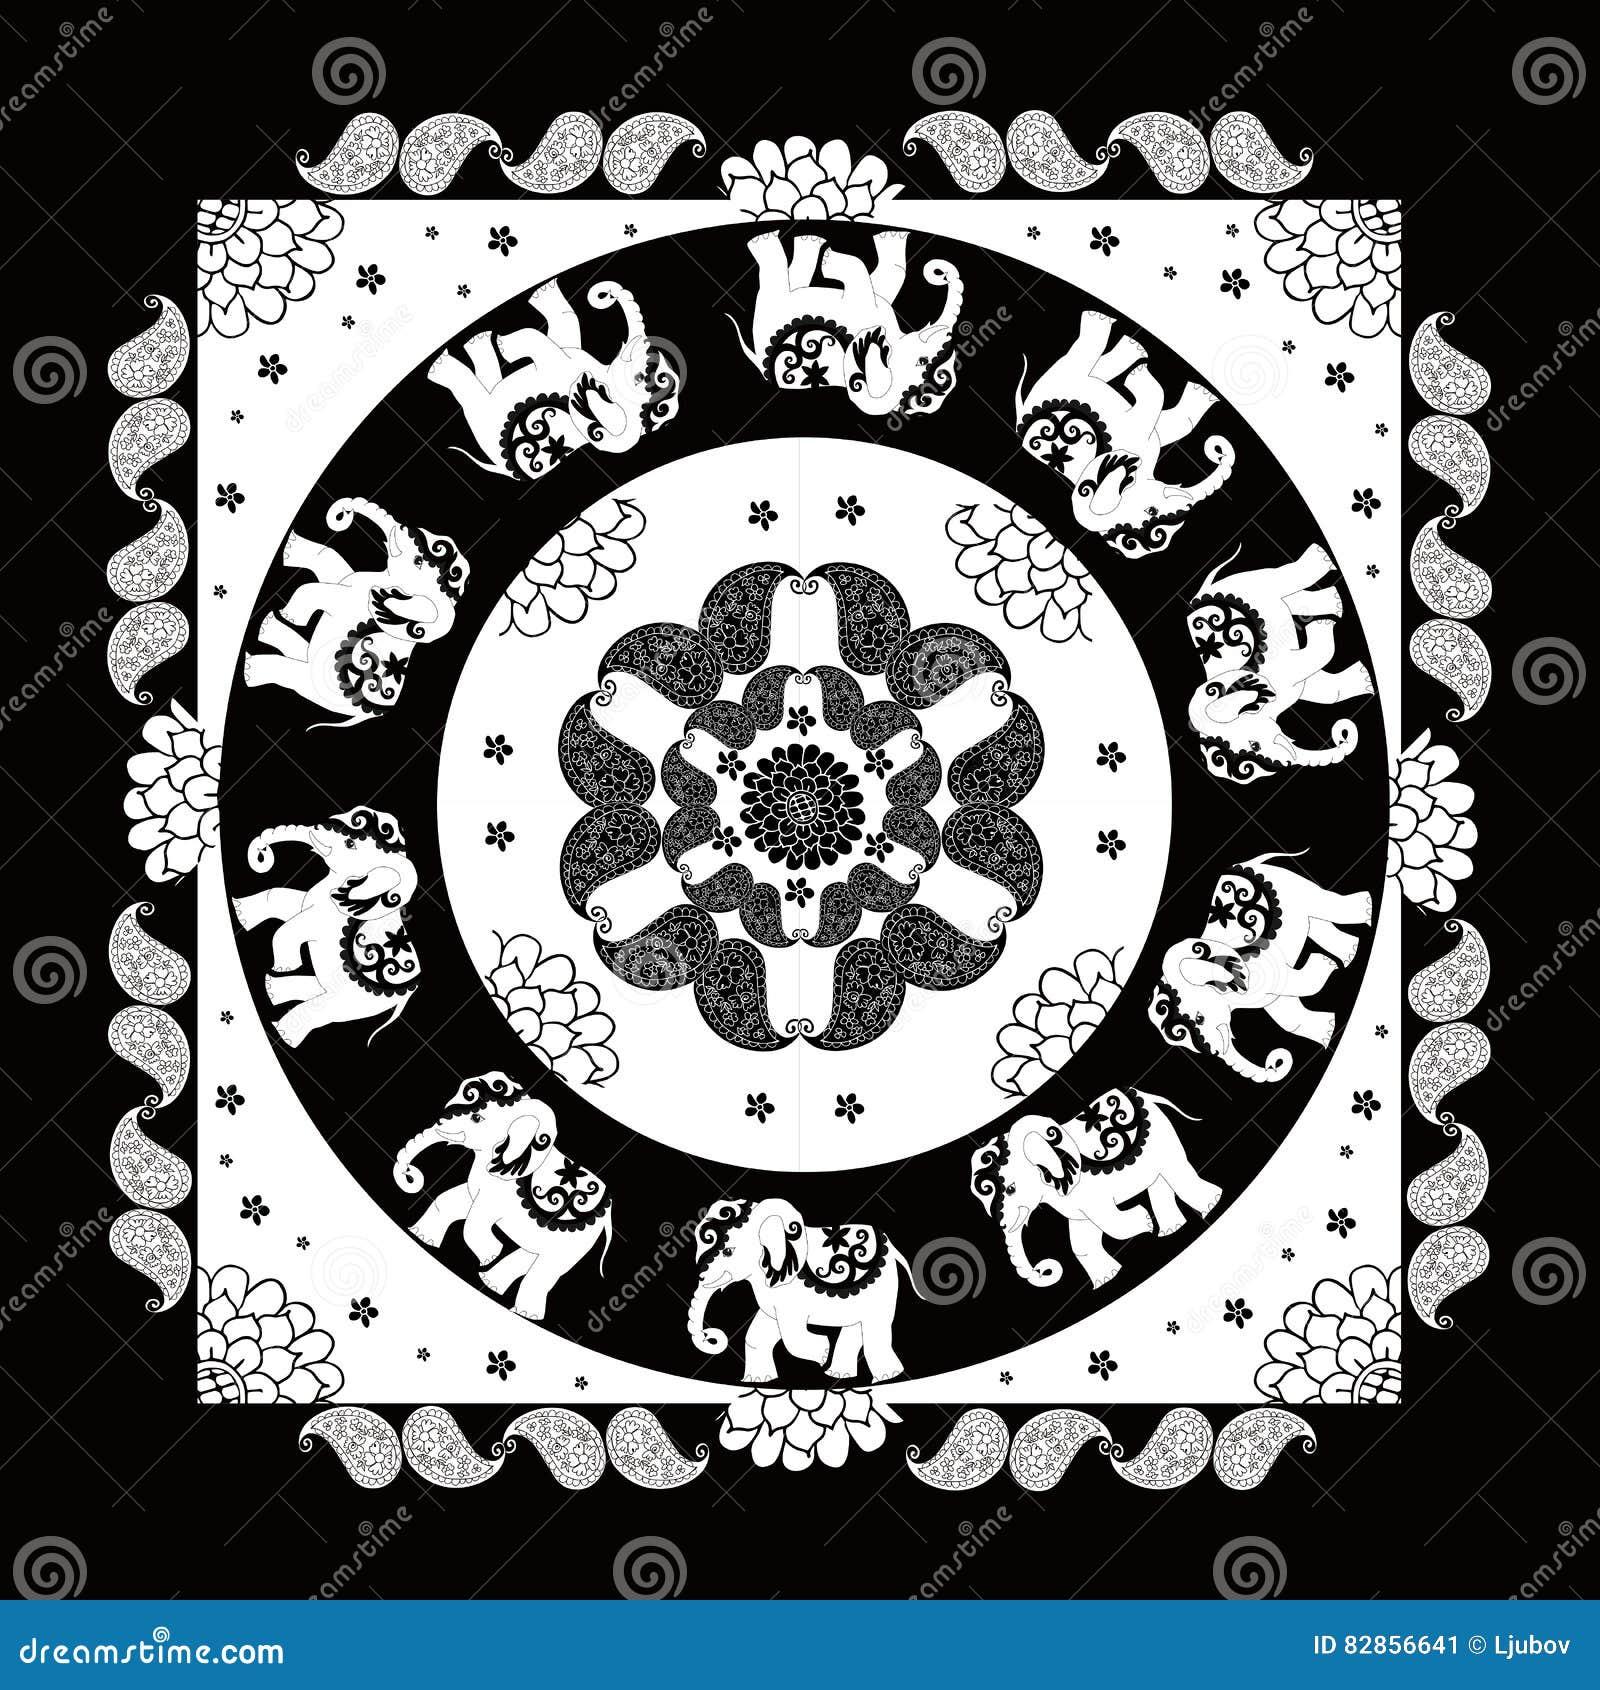 India Black White Ethnic Bandana Print Beautiful Flowers Paisley Elephants Summer Kerchief Square Pattern Design 82856641